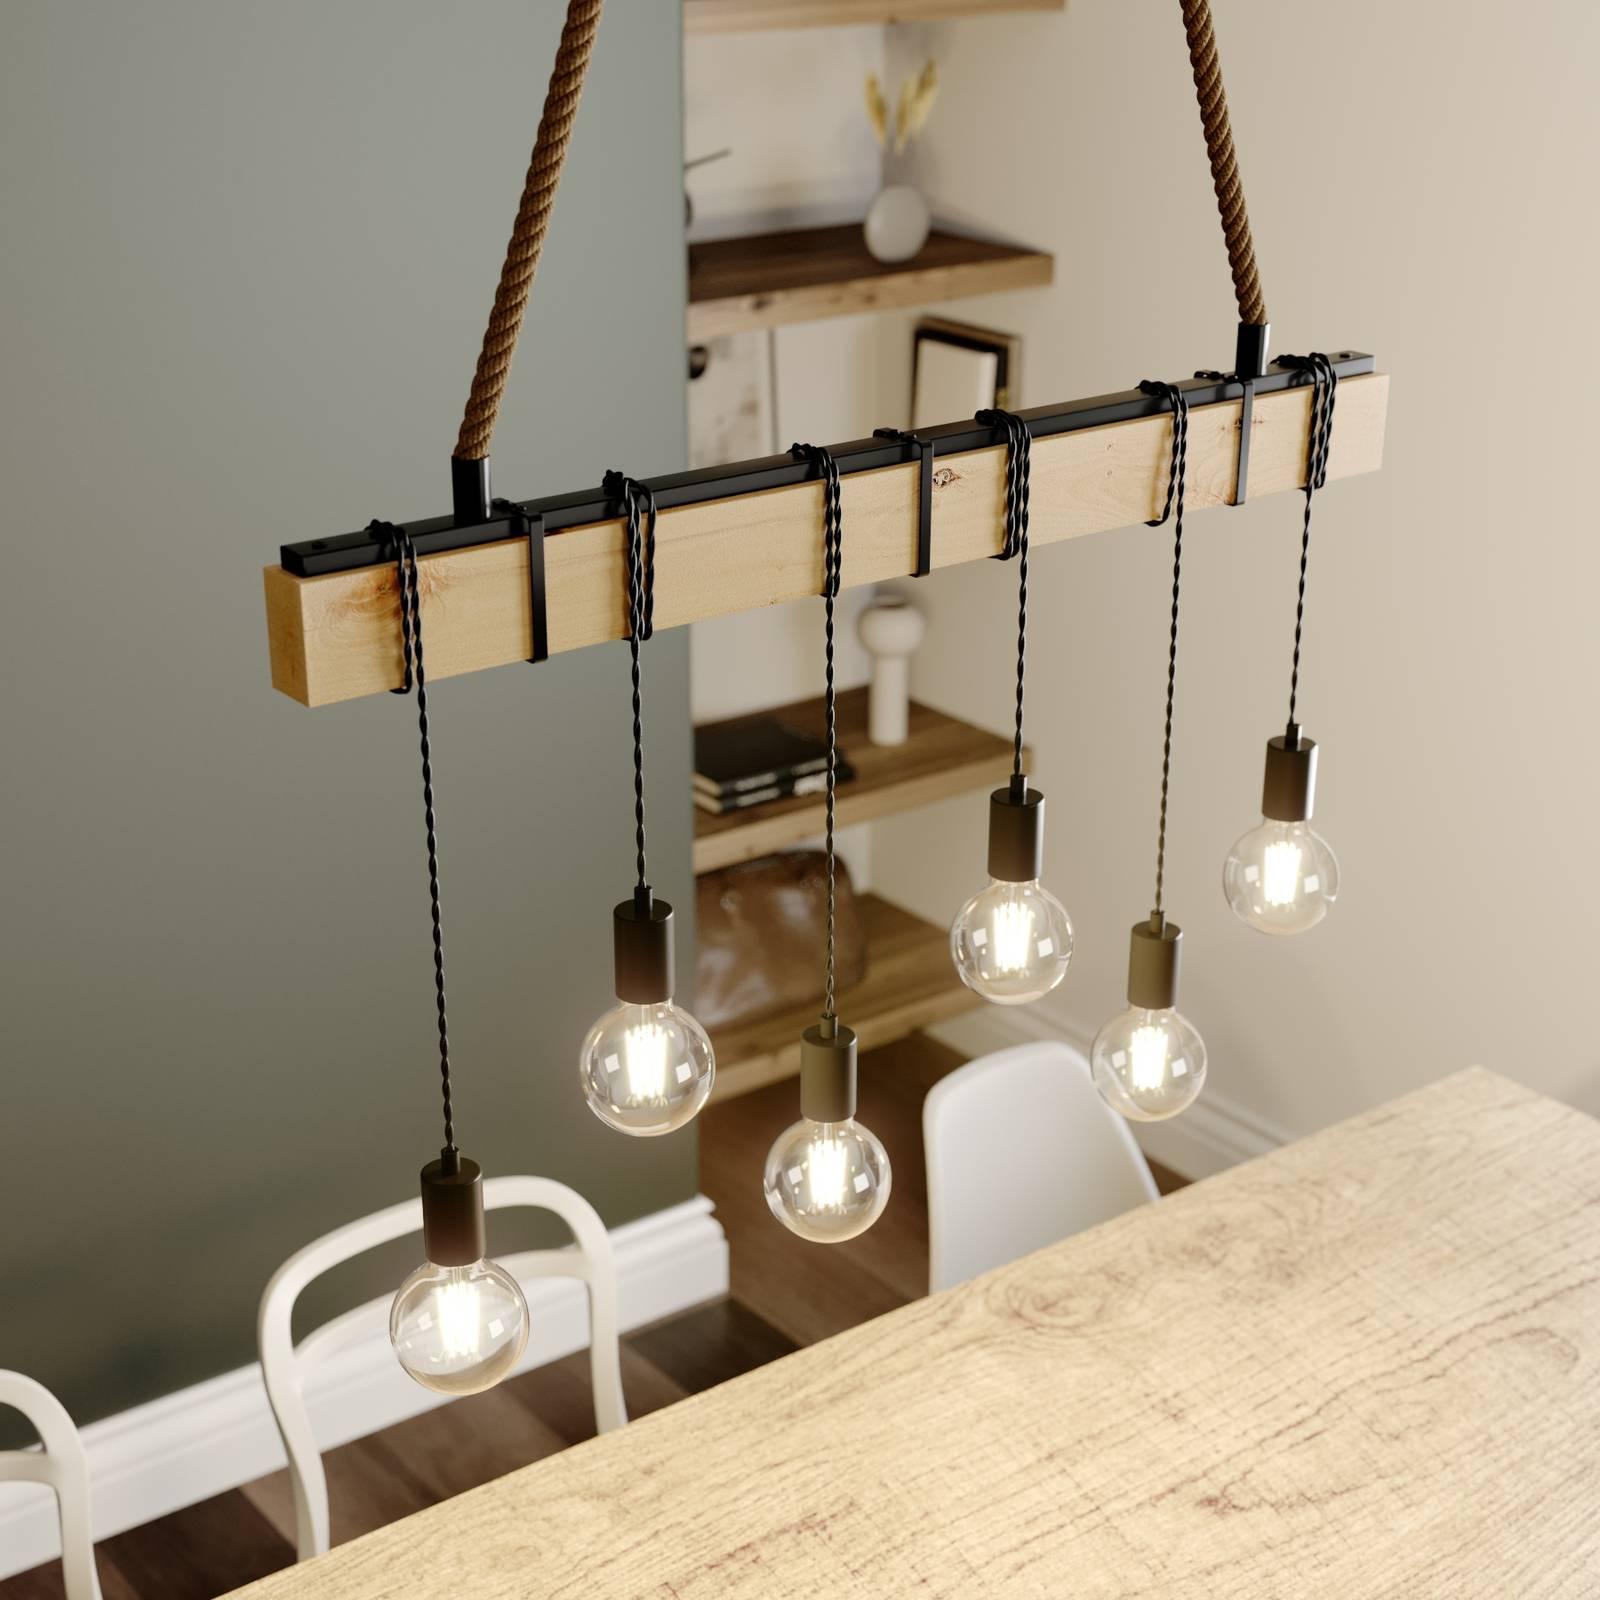 Balk hanglamp Cintia met hout, 6-lamps